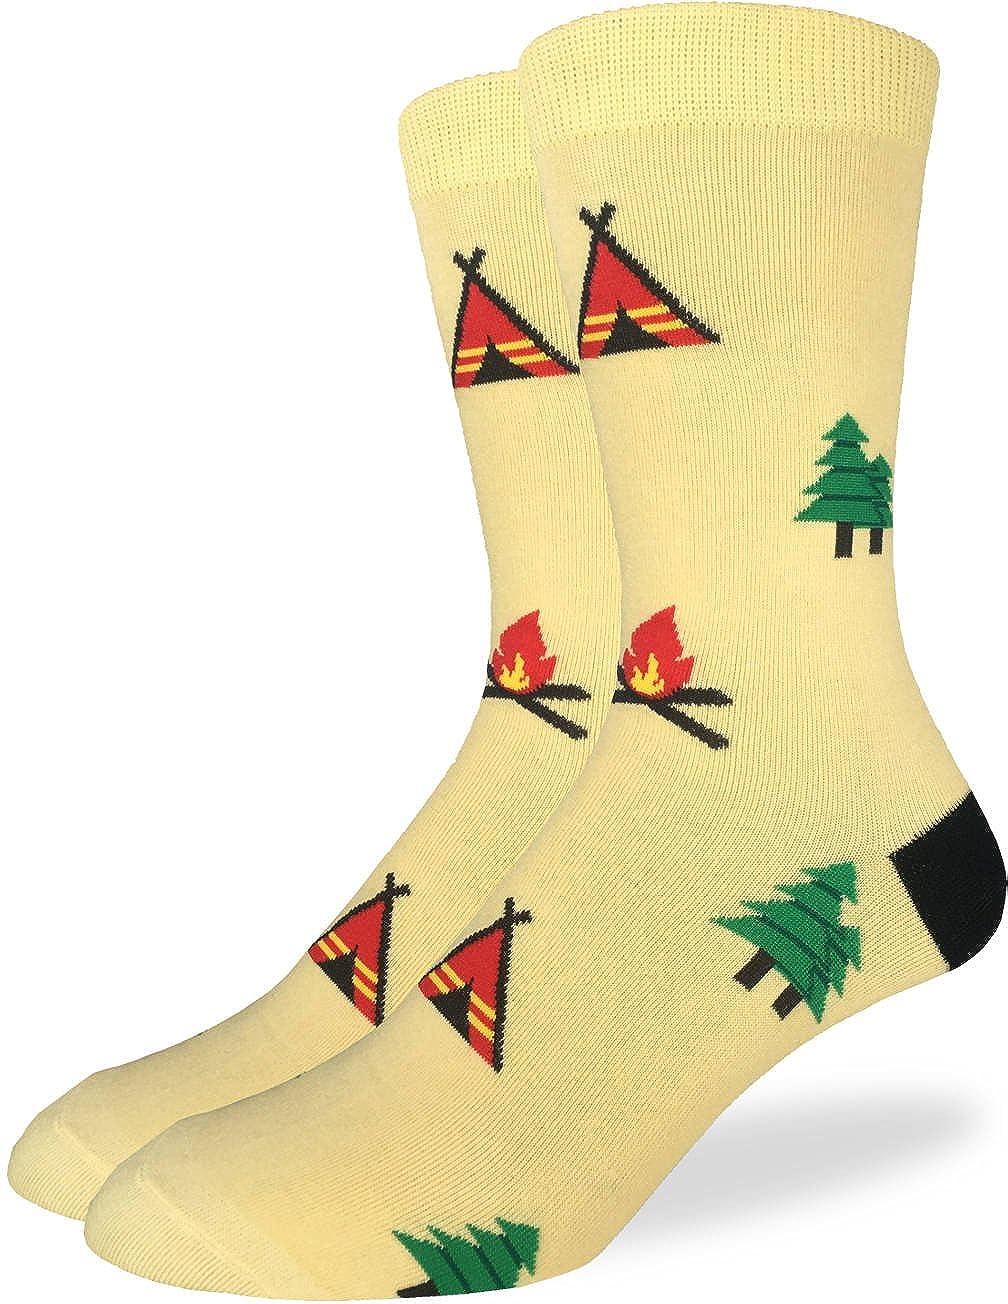 ff414c78417867 Amazon.com  Good Luck Sock Men s Camping Crew Socks - Yellow